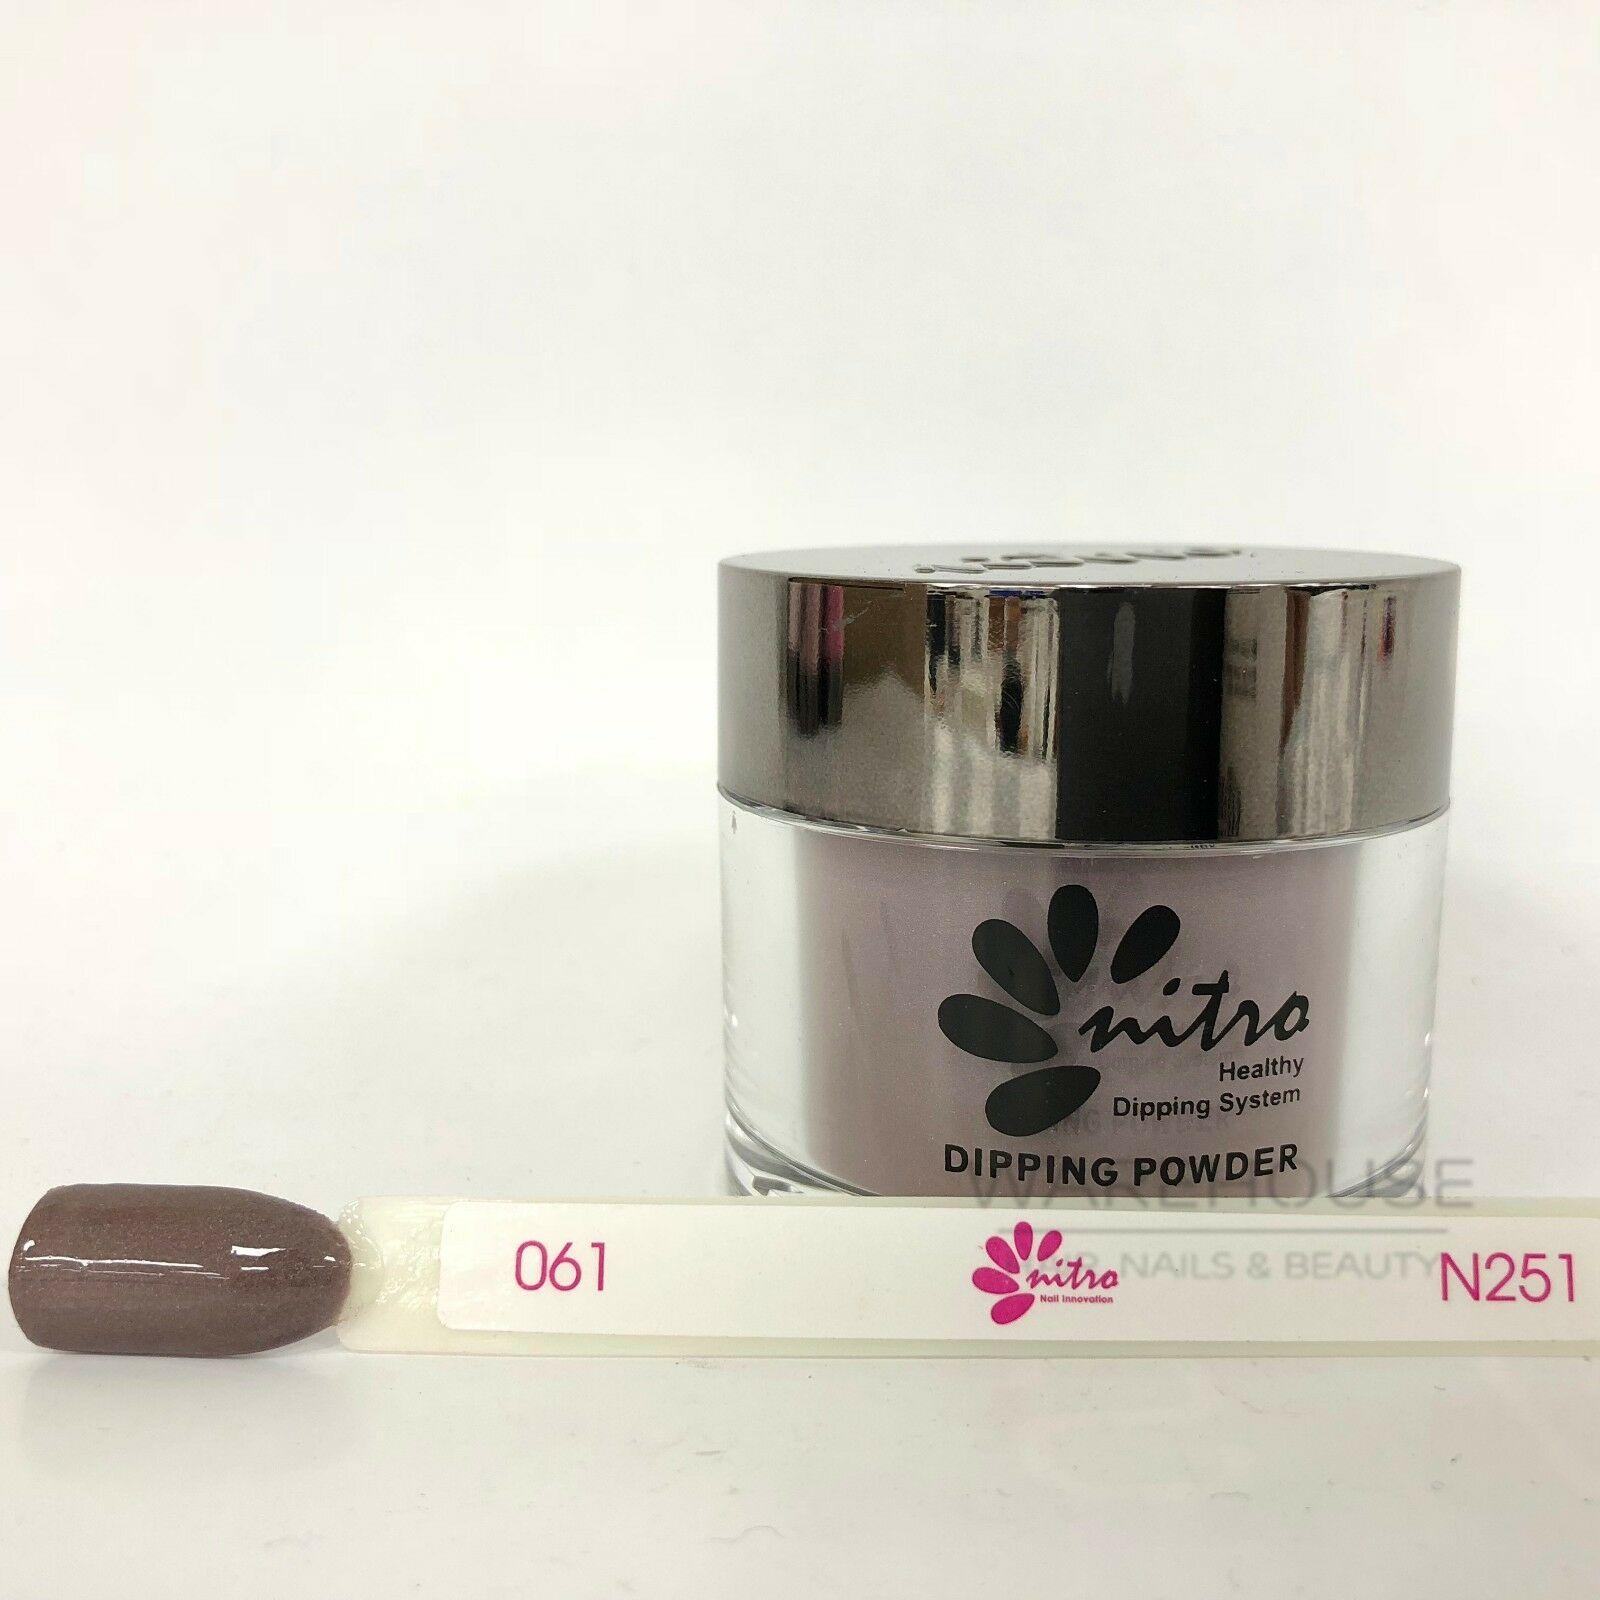 NITRO Matching SNS Gelish Dip Dipping Powder Nail System Color 59 g (61 - 120)